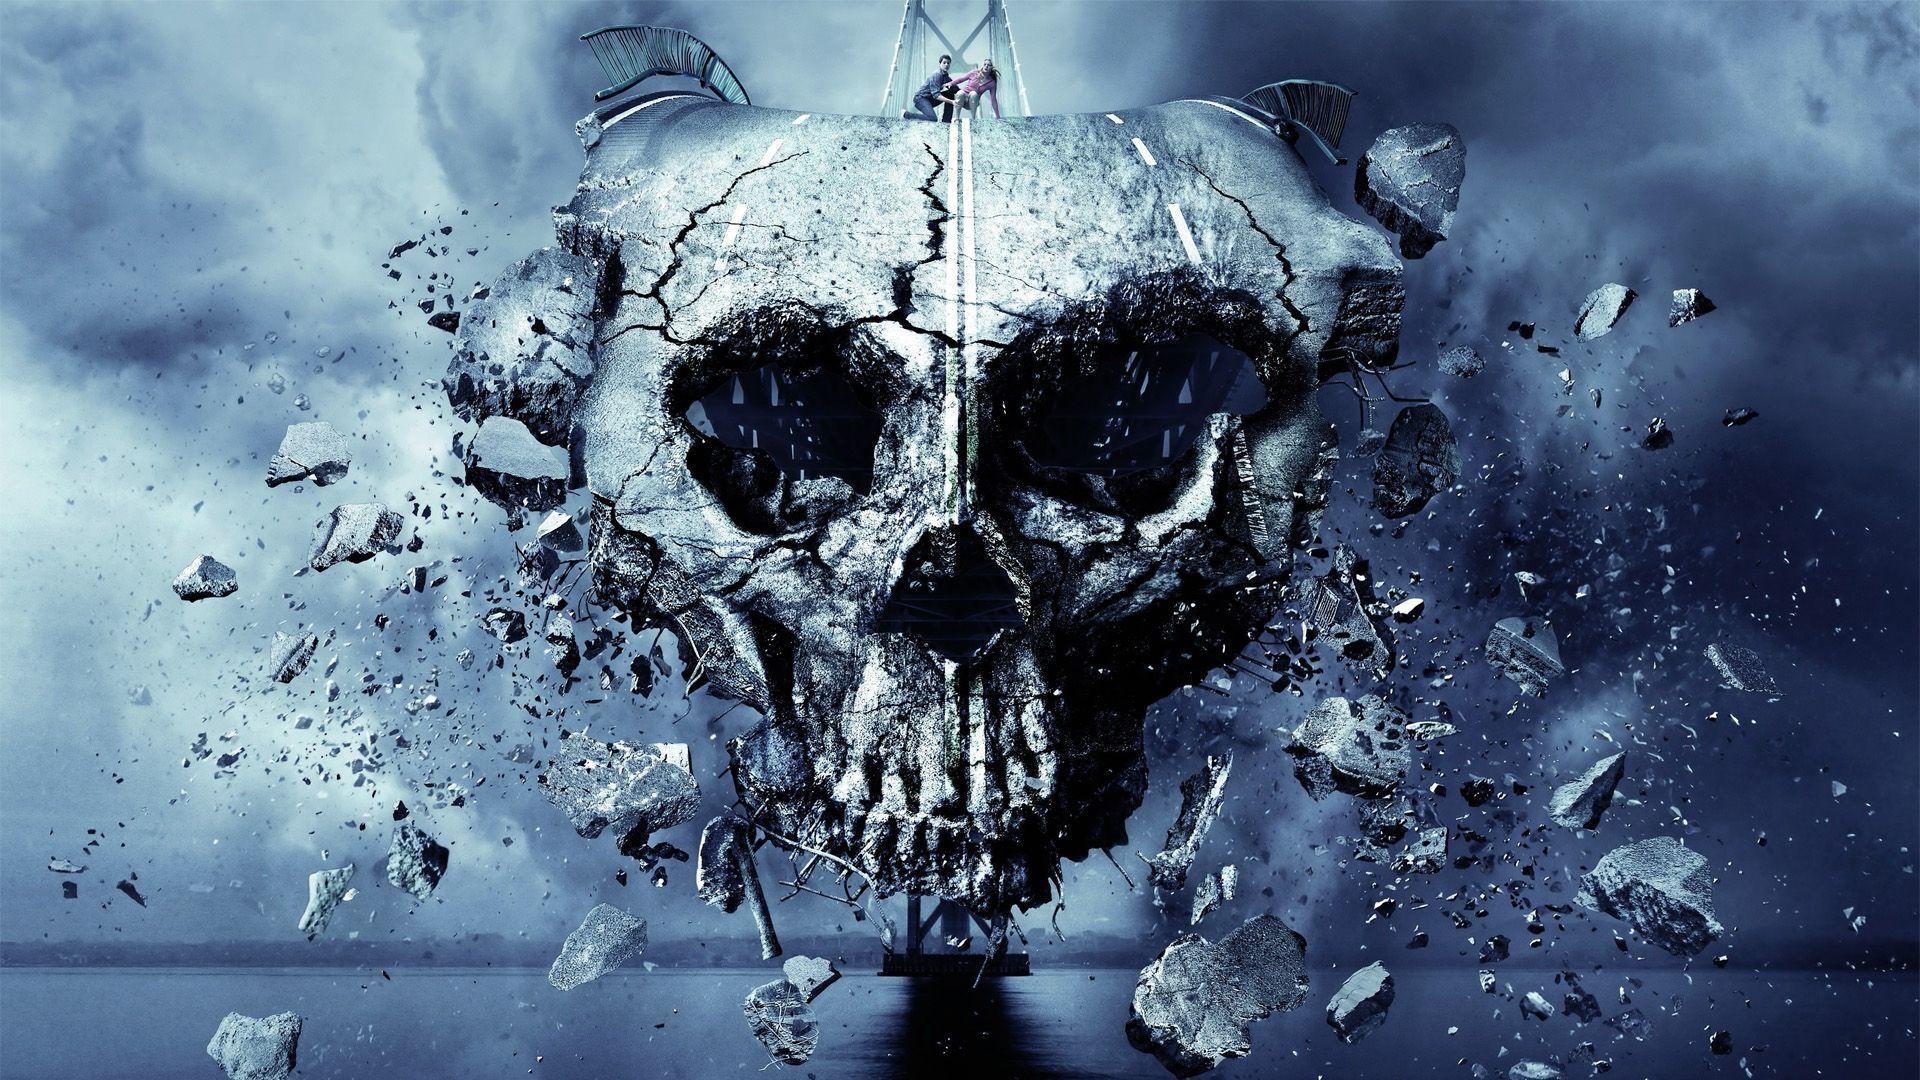 Cool Skull Wallpapers Hd 1080P 12 HD Wallpaperscom .